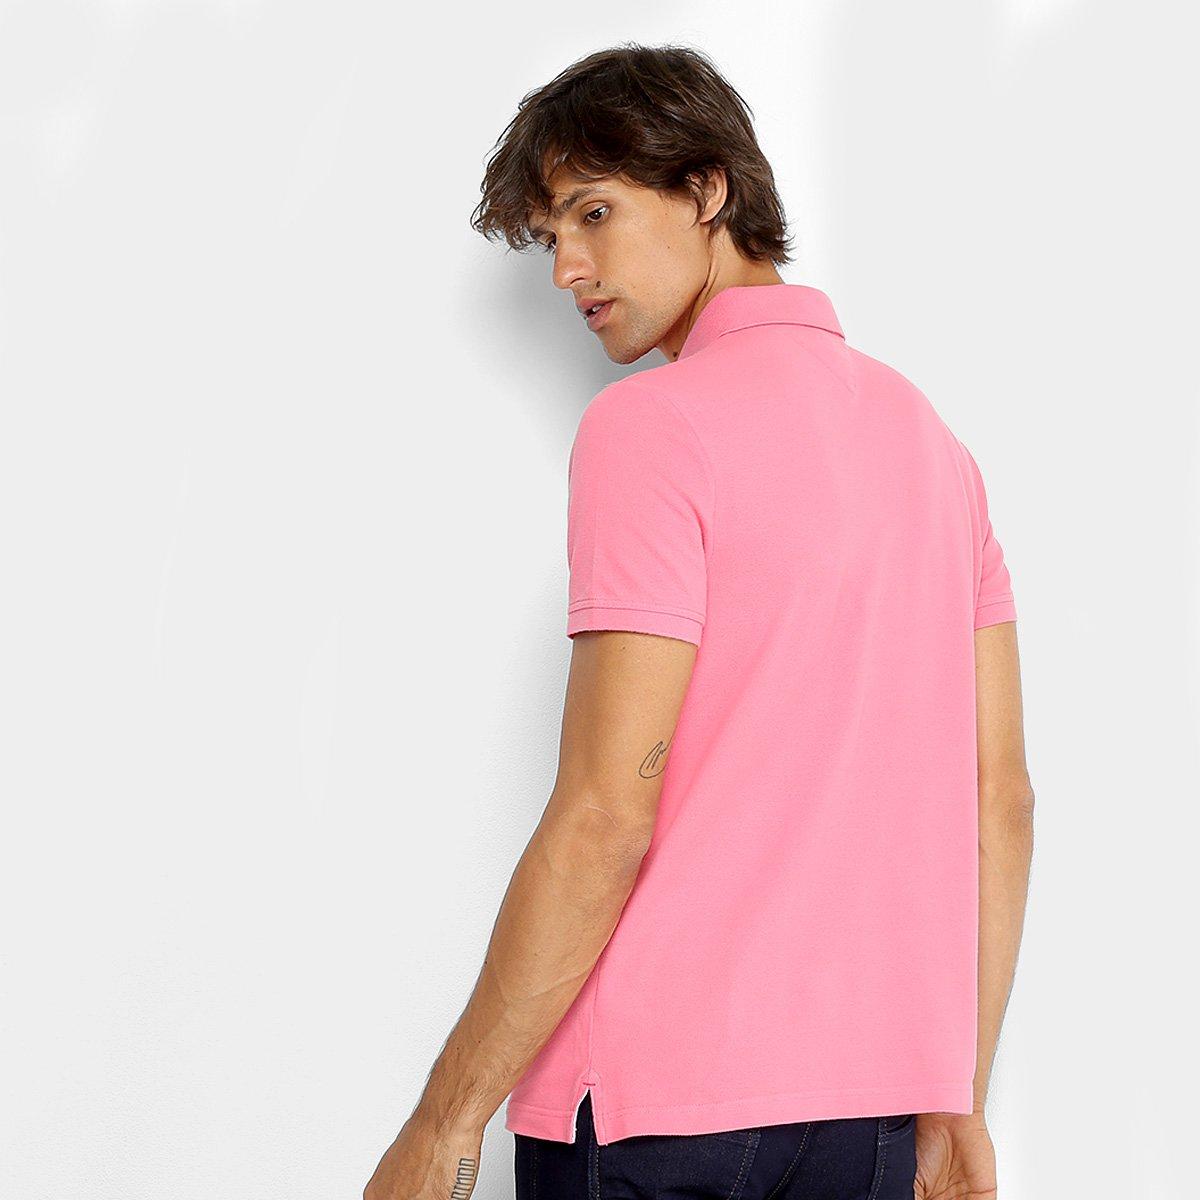 5ea4cd813b Camisa Polo Tommy Hilfiger Básica Masculina